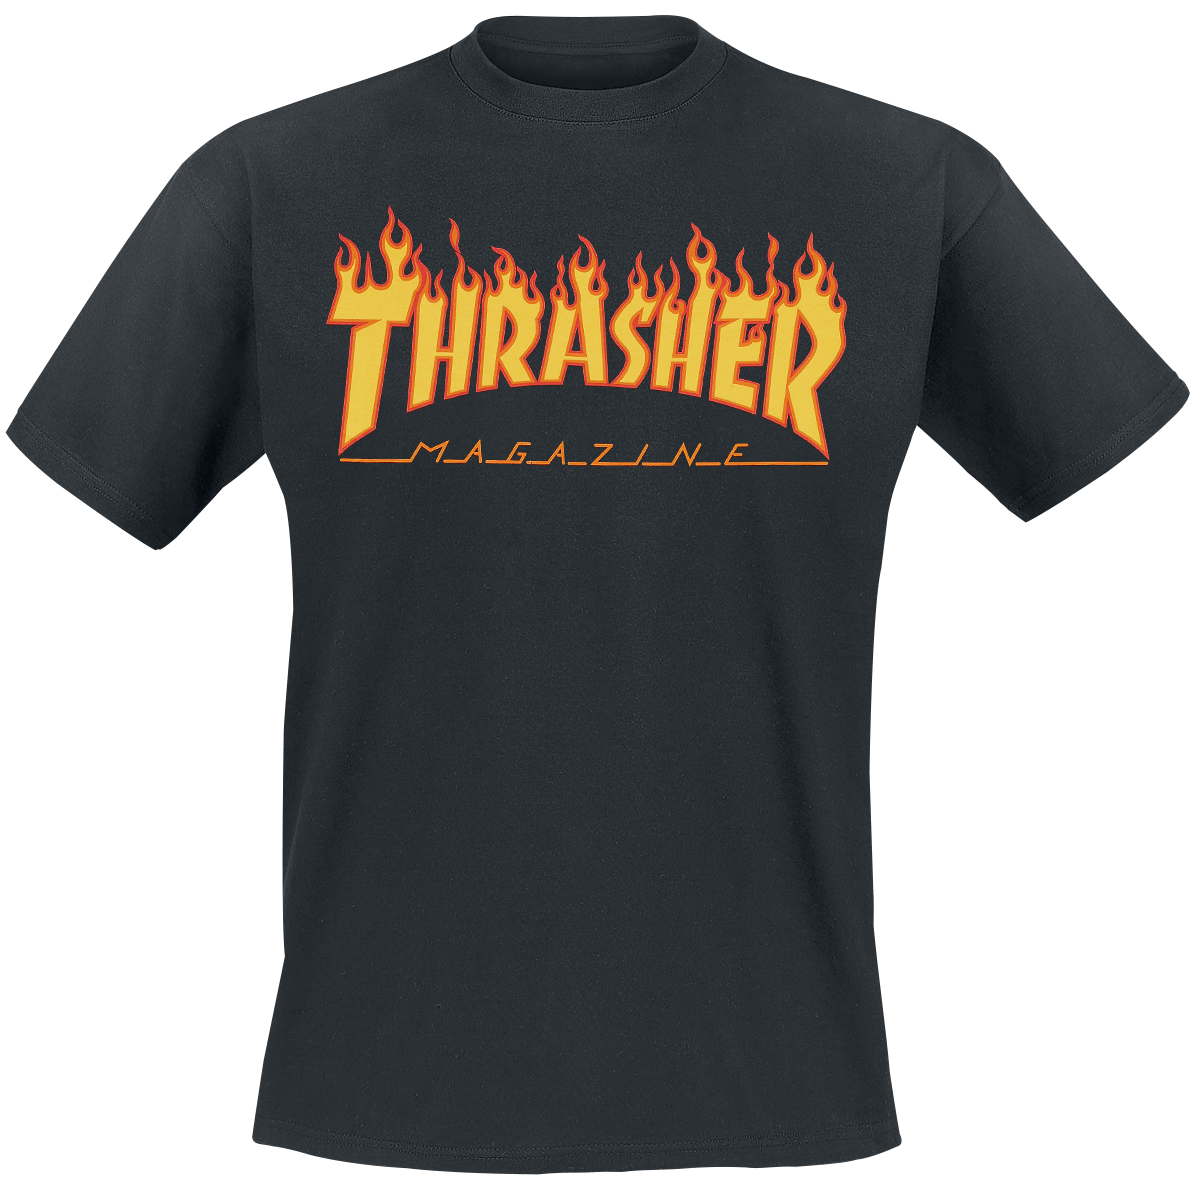 Thrasher - Flame - T-Shirt - black image